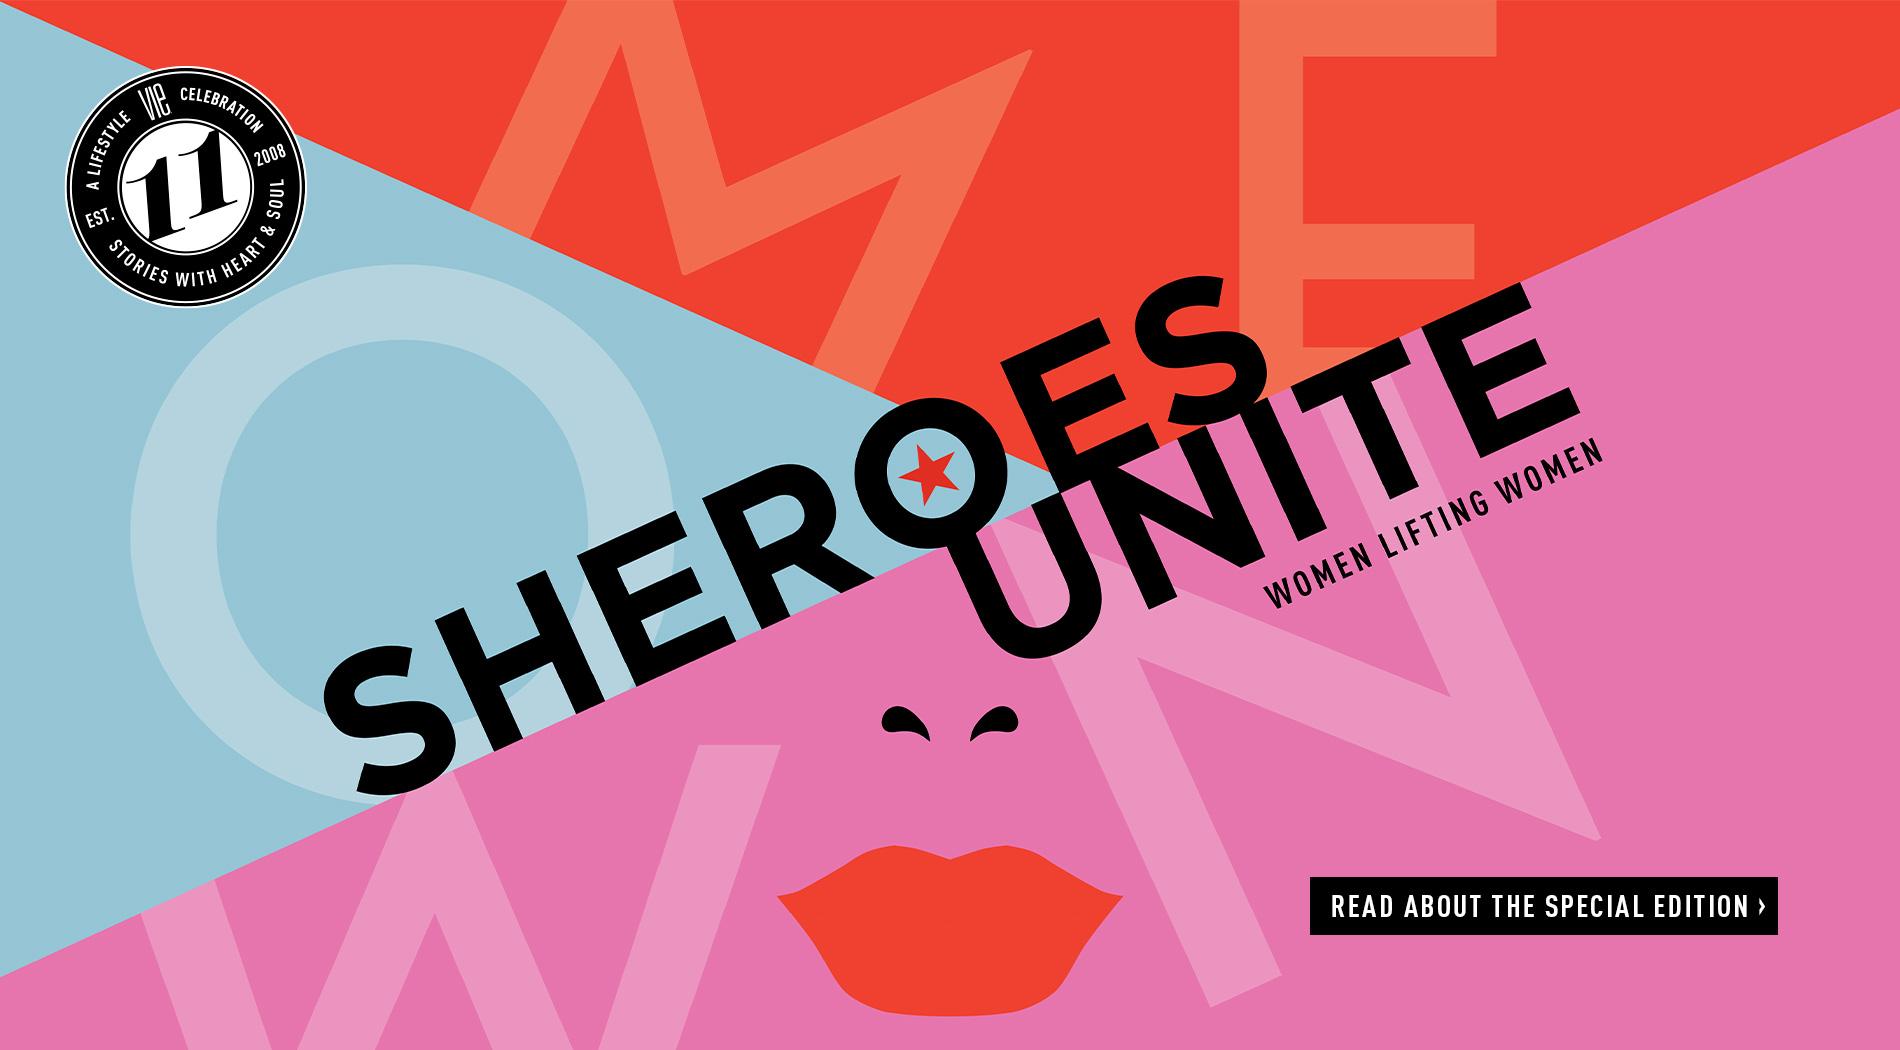 VIE Magazine - Women's Issue - December 2019 - Sheroes Unite, Special Women's Edition